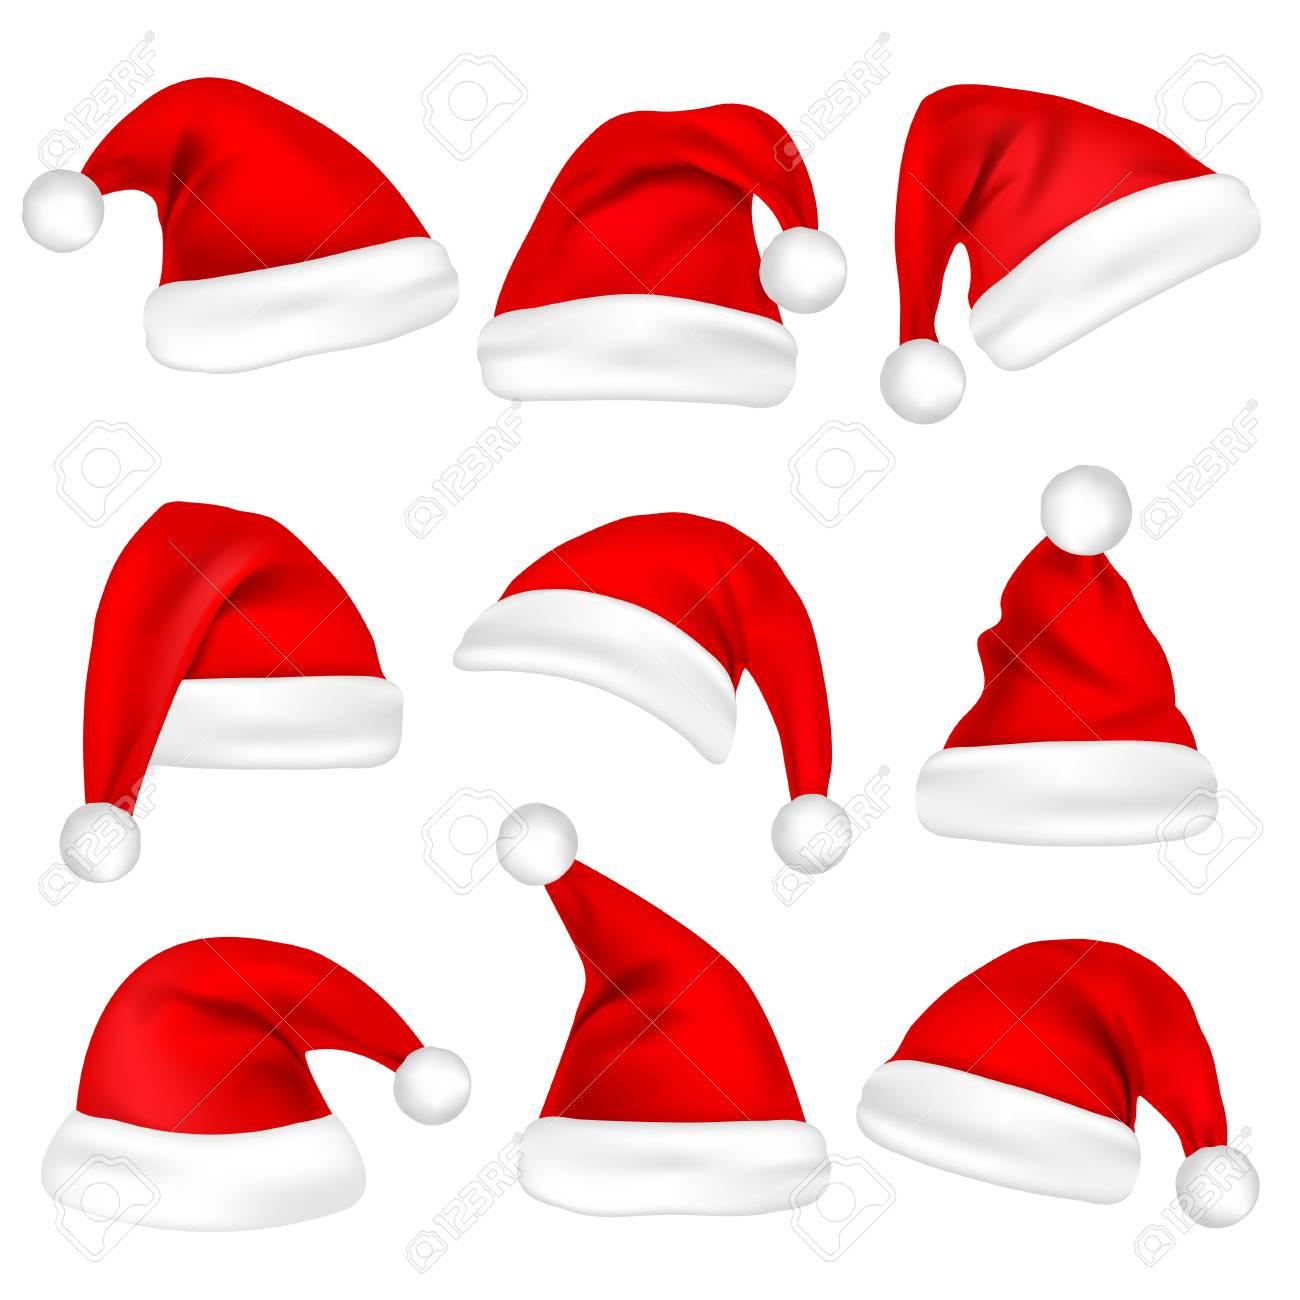 Christmas Santa hats. - 88397637